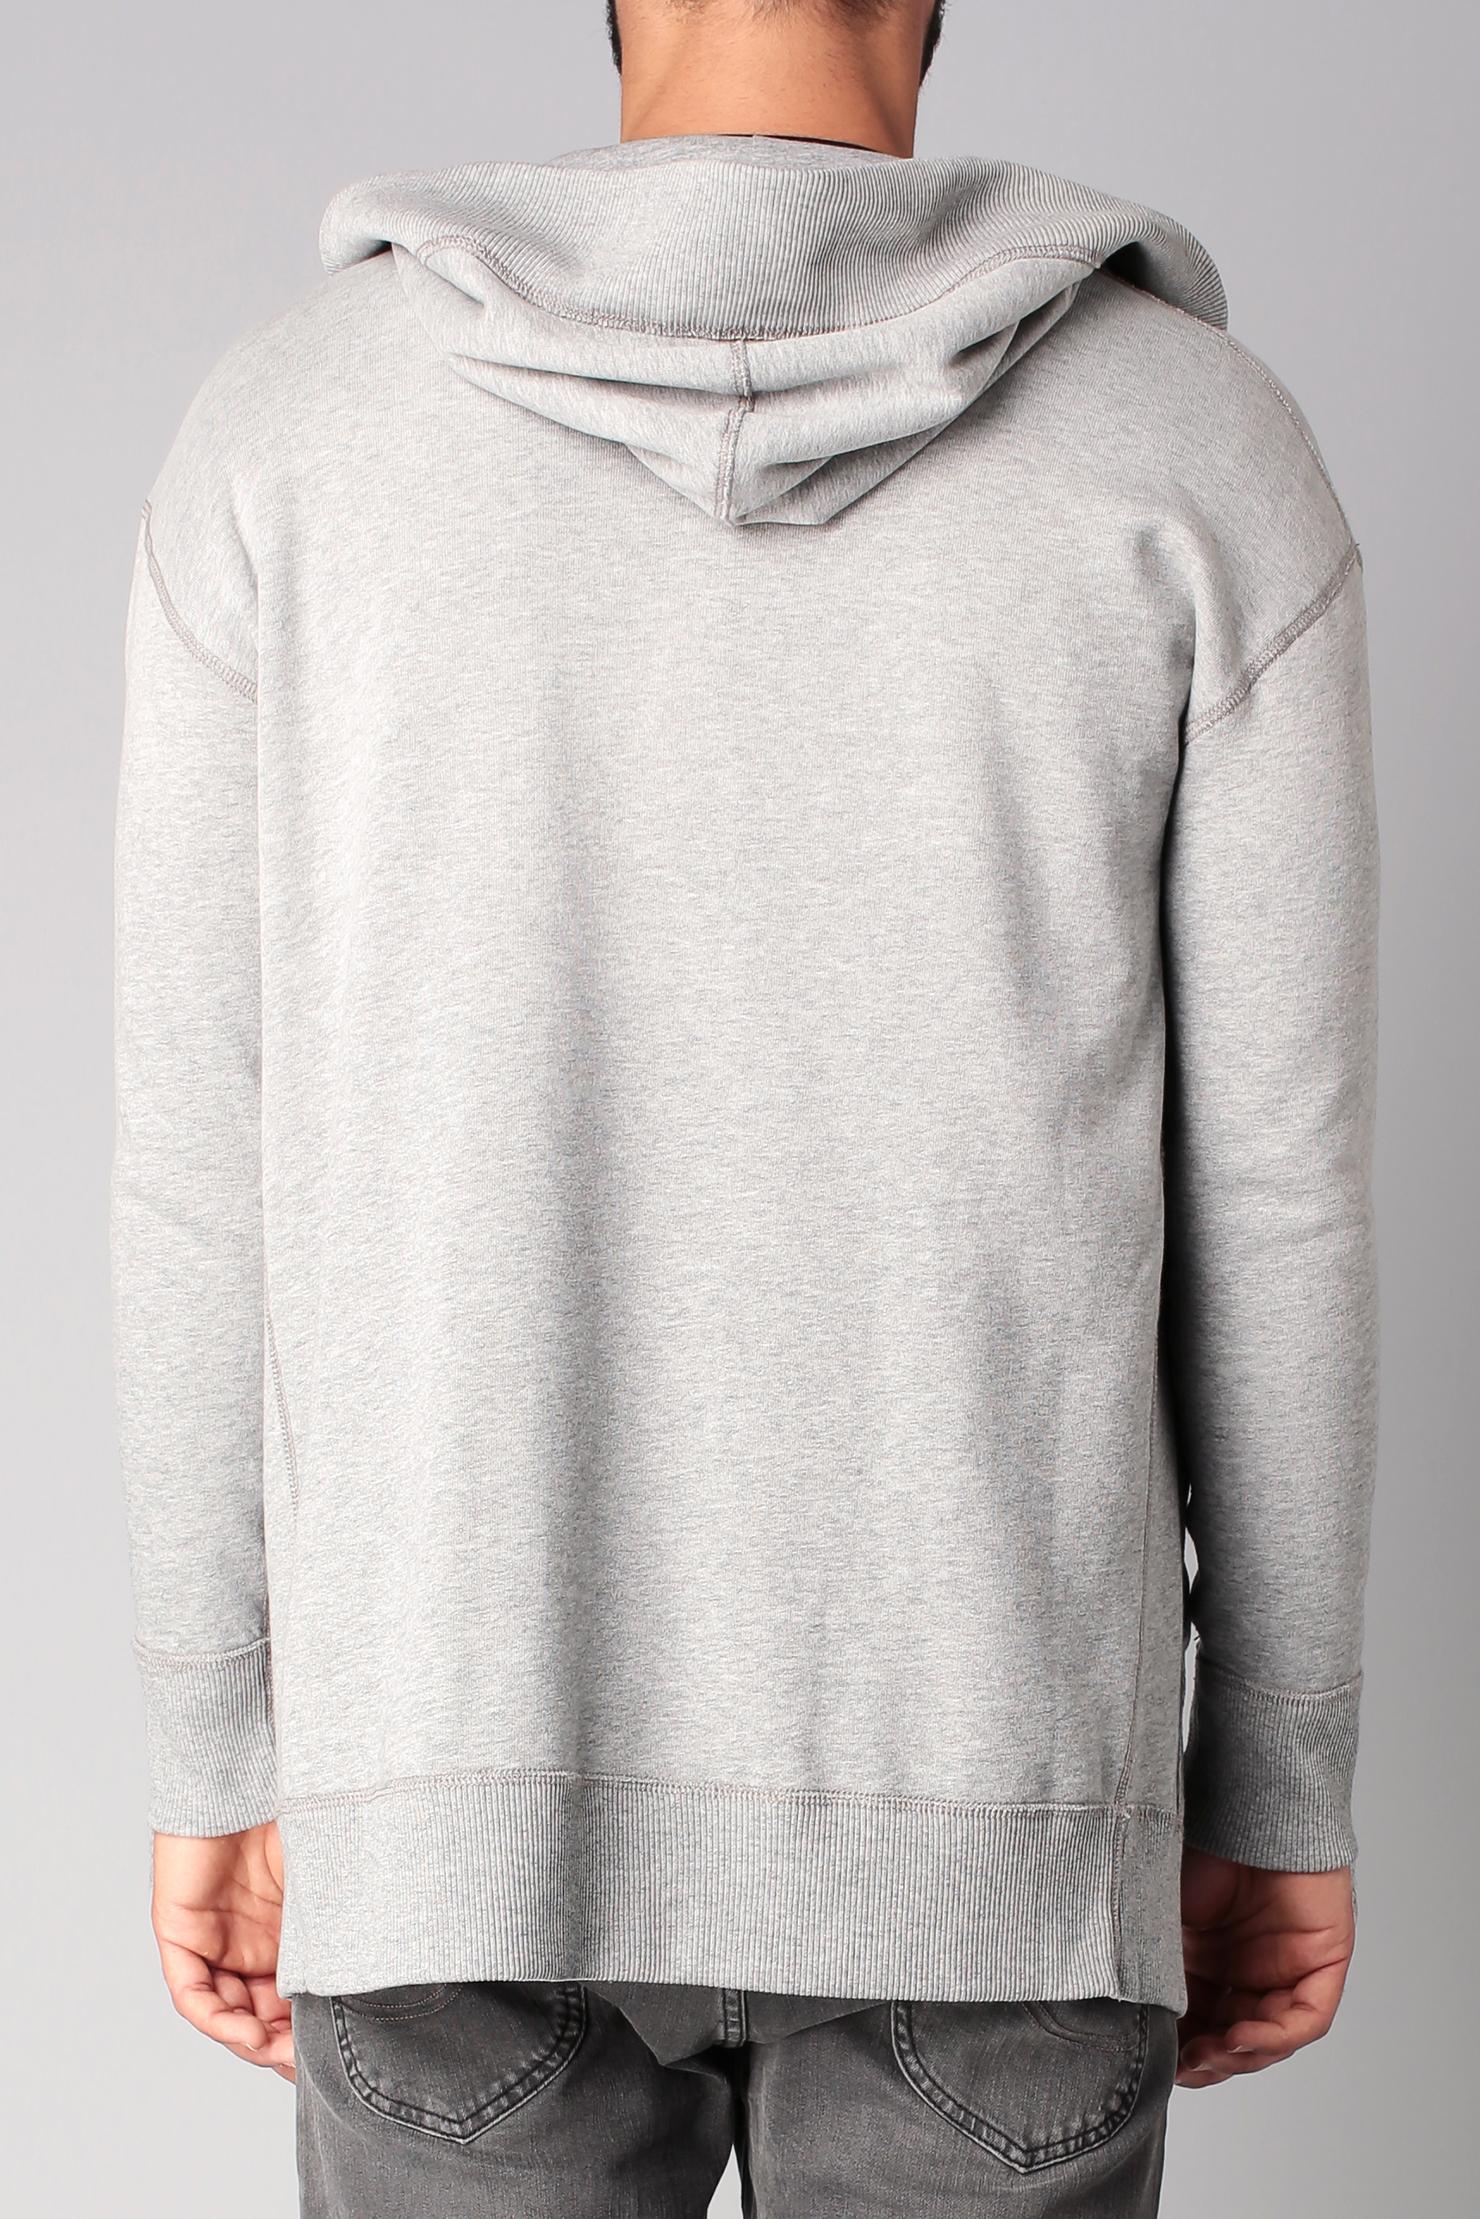 polo ralph lauren sweatshirt in gray for men lyst. Black Bedroom Furniture Sets. Home Design Ideas